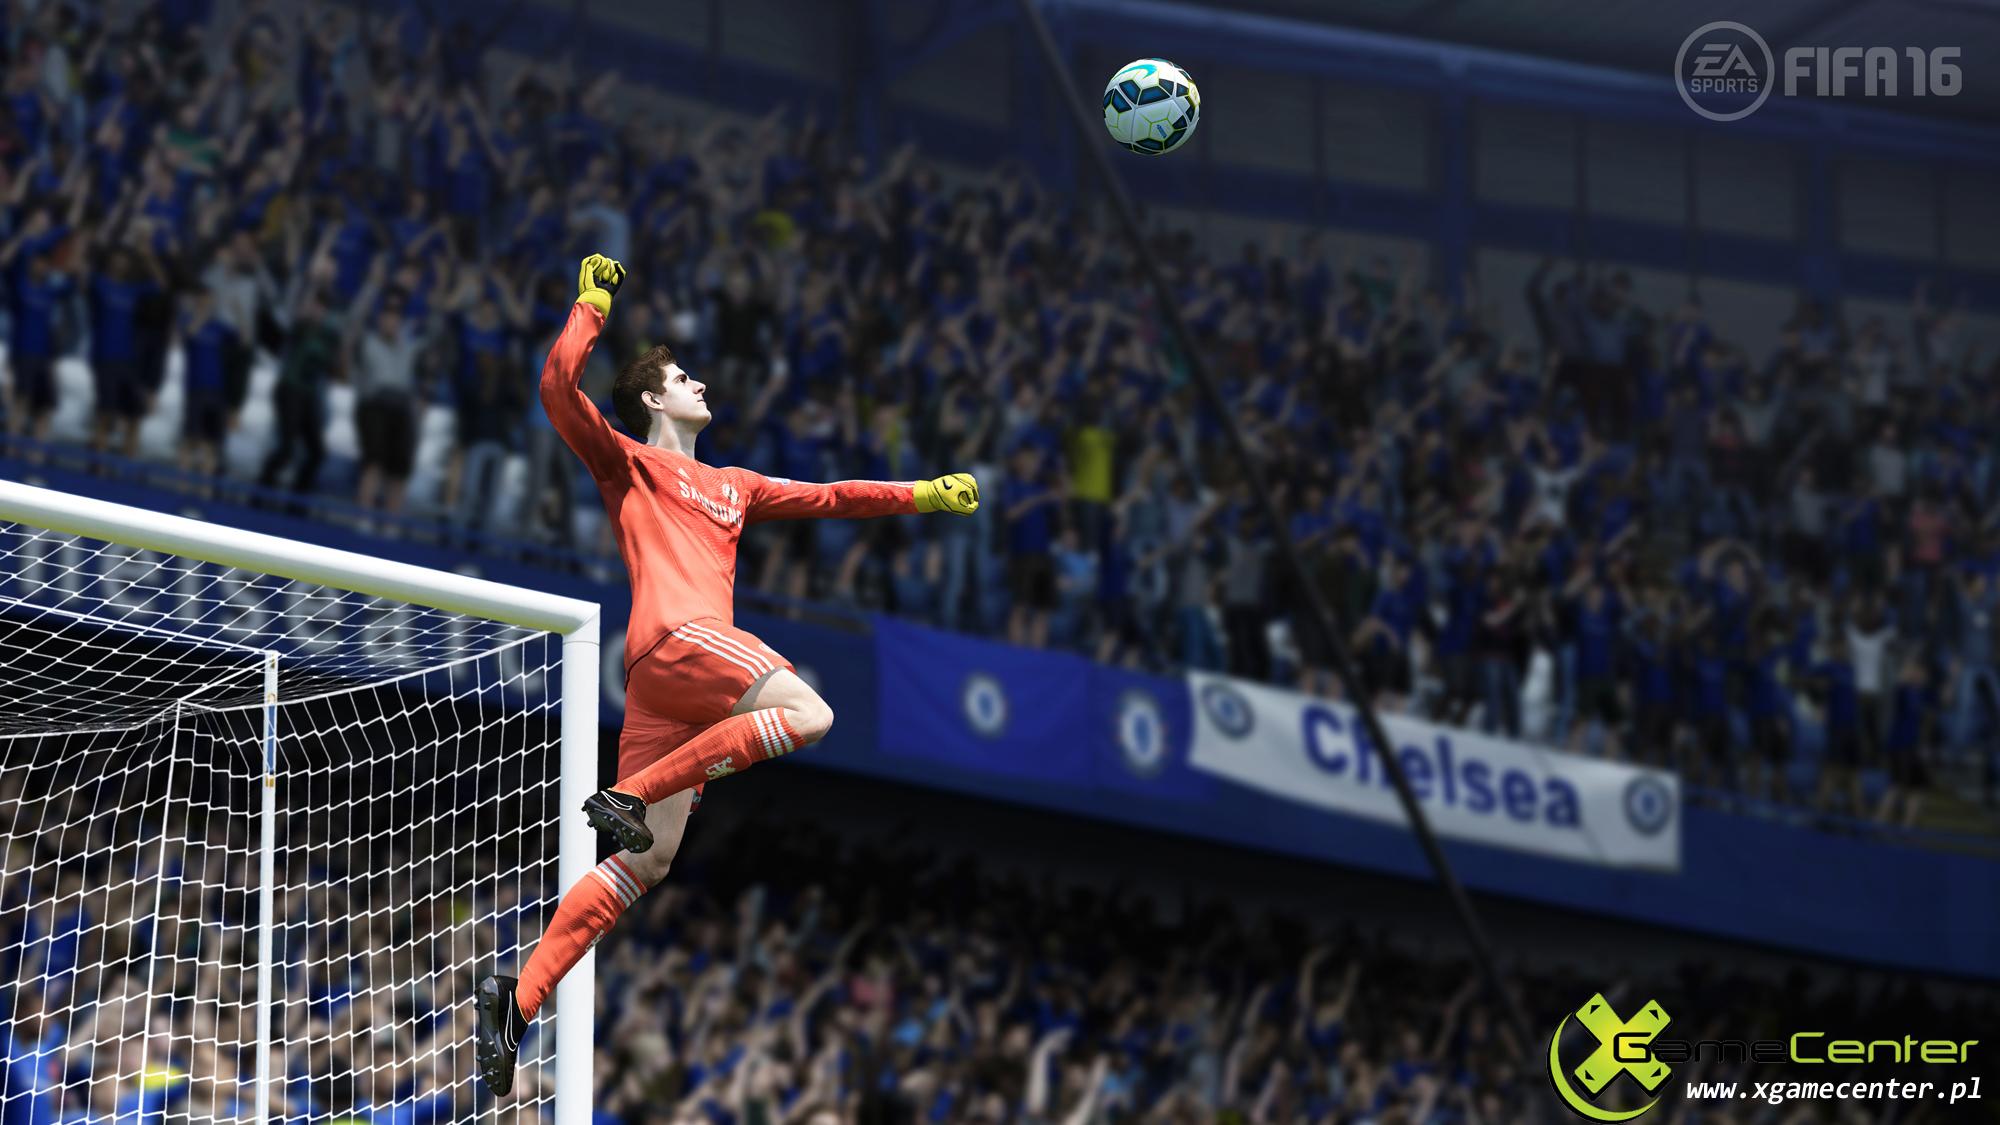 FIFA16 XboxOne PS4 E3 Courtois HR screen xgamecenter